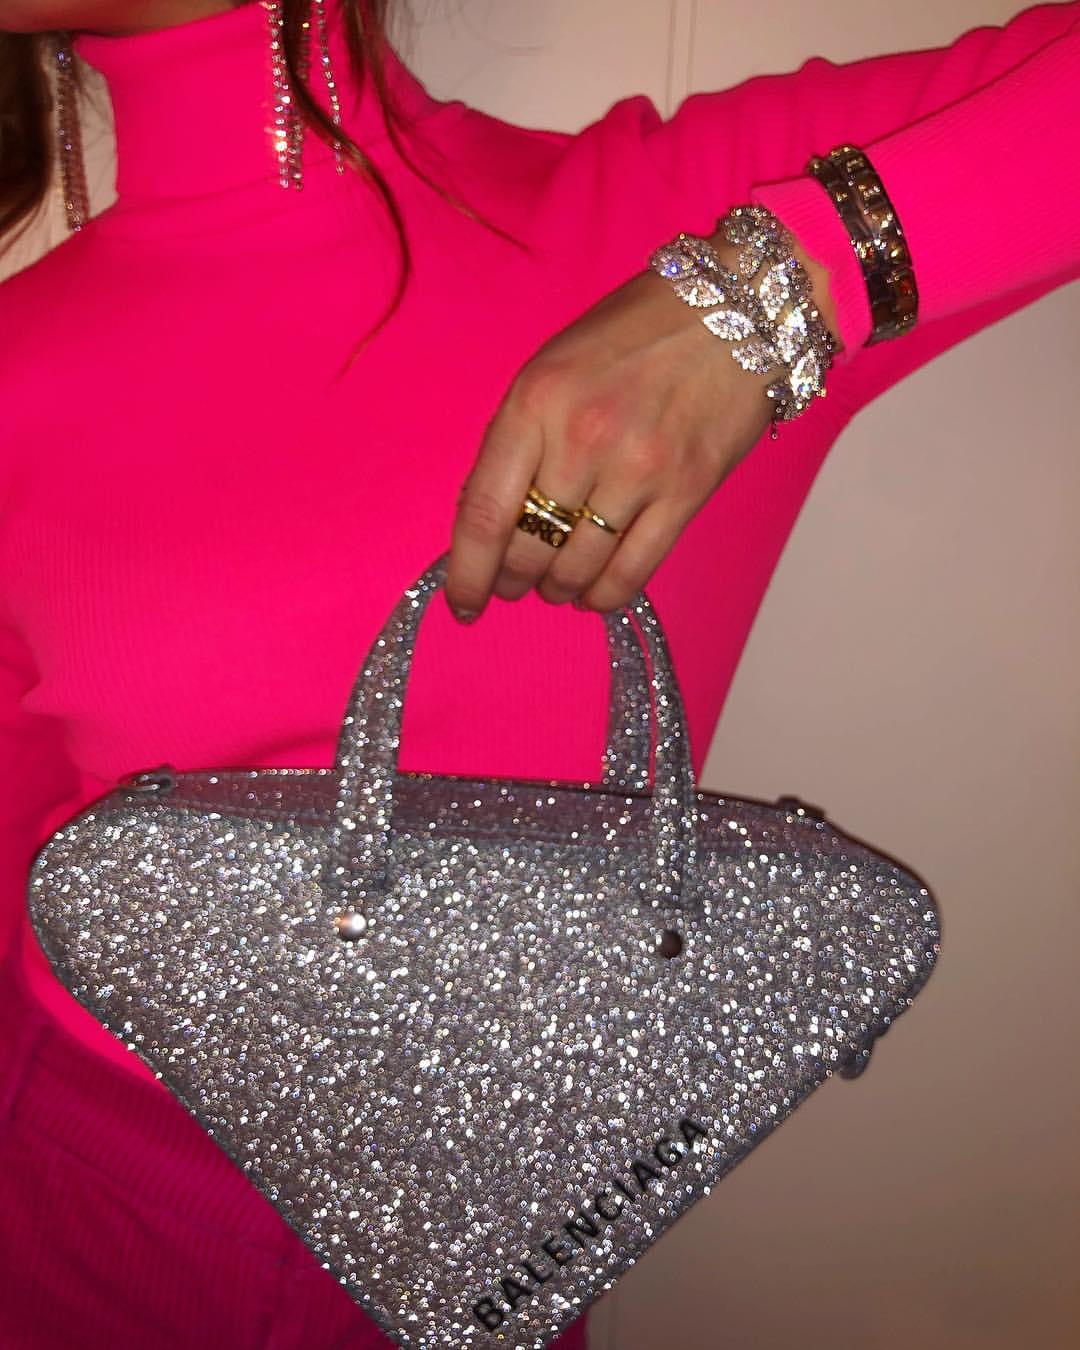 89e87e05006d Έντονα χρώματα και αξεσουάρ με glitter  Γιατί όχι  Οι συνδυασμοί αυτοί  είναι που θα σε κάνουν να ξεχωρίσεις όταν φοράς ένα μονόχρωμο σύνολο.